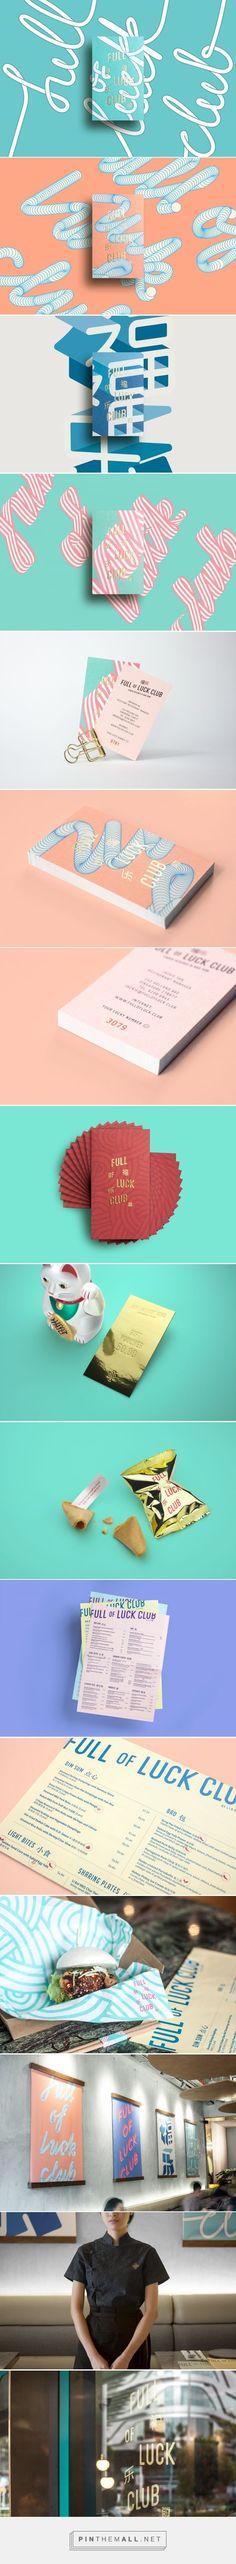 Branding | Graphic Design | Full of Luck Club by Bravo on Behance